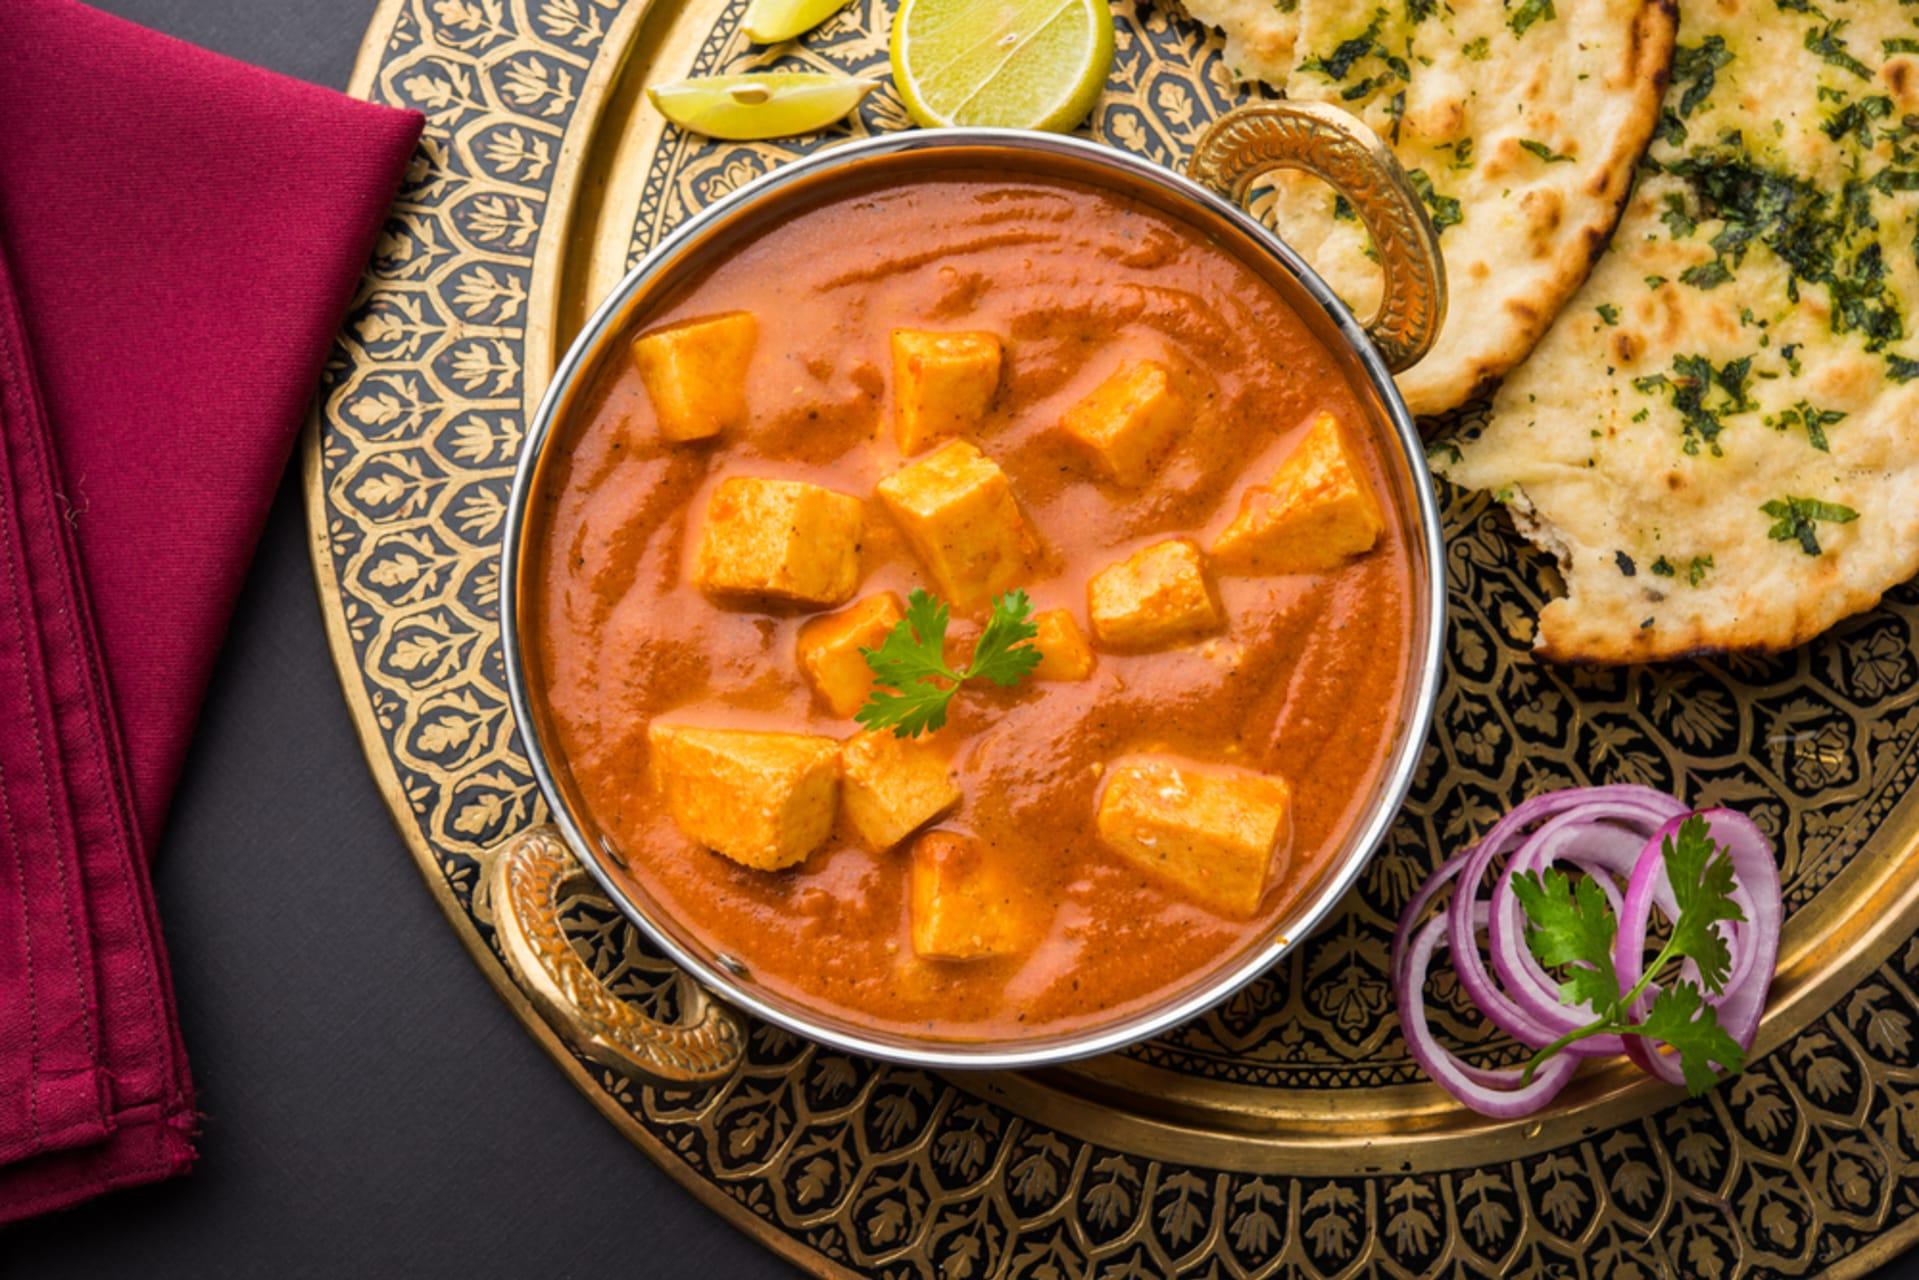 Delhi - Tempting Indian Shahi Paneer/Tofu with Indian Bread